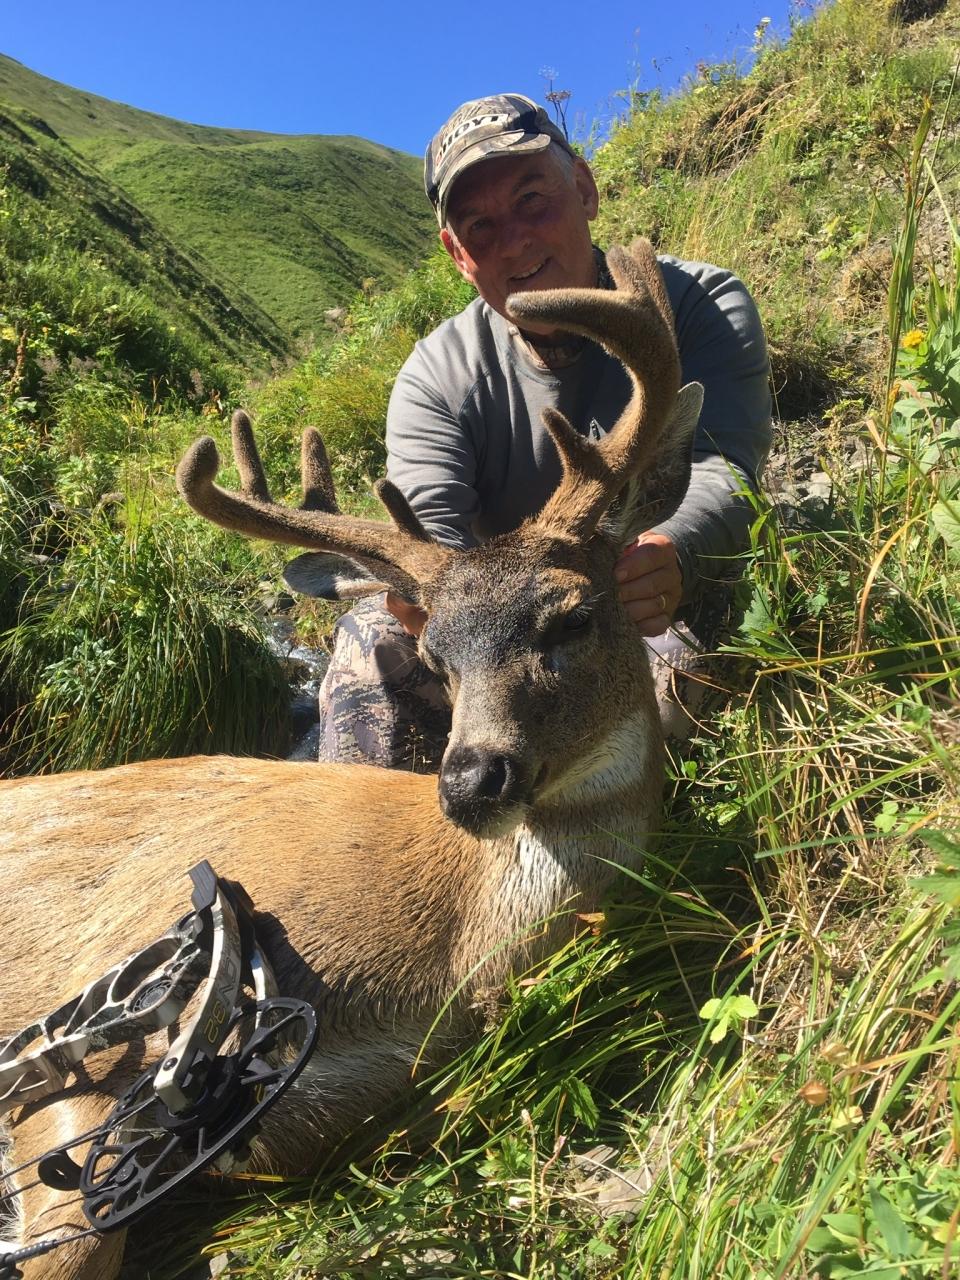 Kodiak Sitka Blacktail With Hunt Alaska Outfitters 2019-01-23